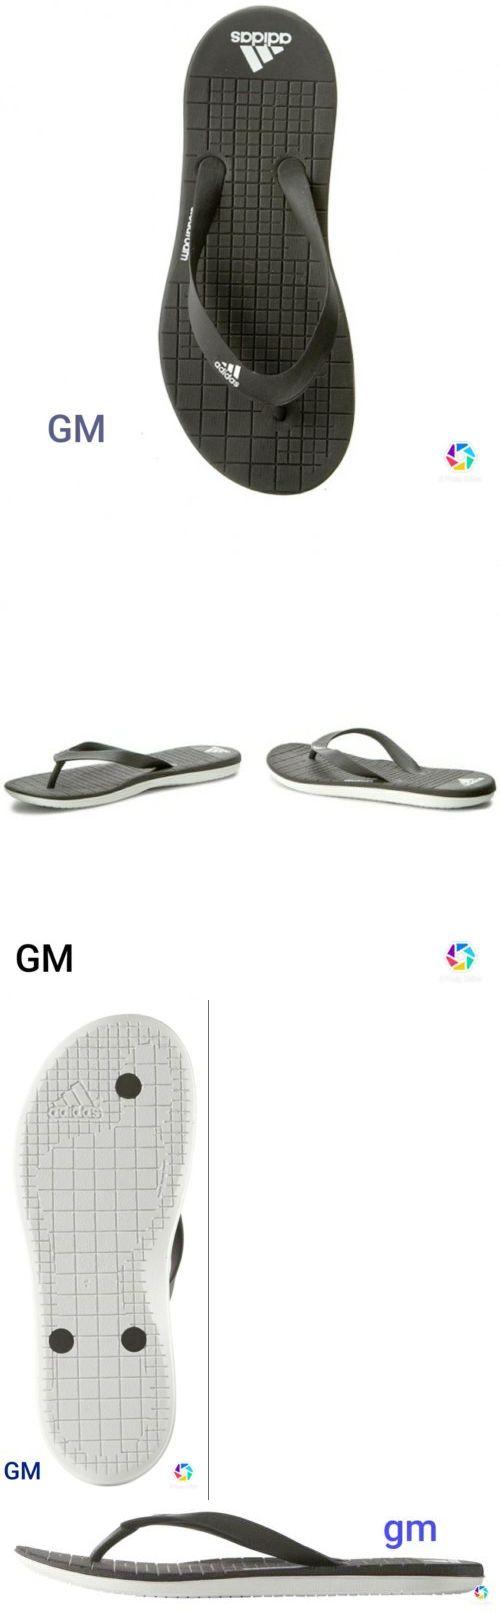 Sandals and Flip Flops 11504: Adidas Performance Eezay Sz13 Thong Black White Men Sandal Flip-Flops New In Box -> BUY IT NOW ONLY: $35 on eBay!